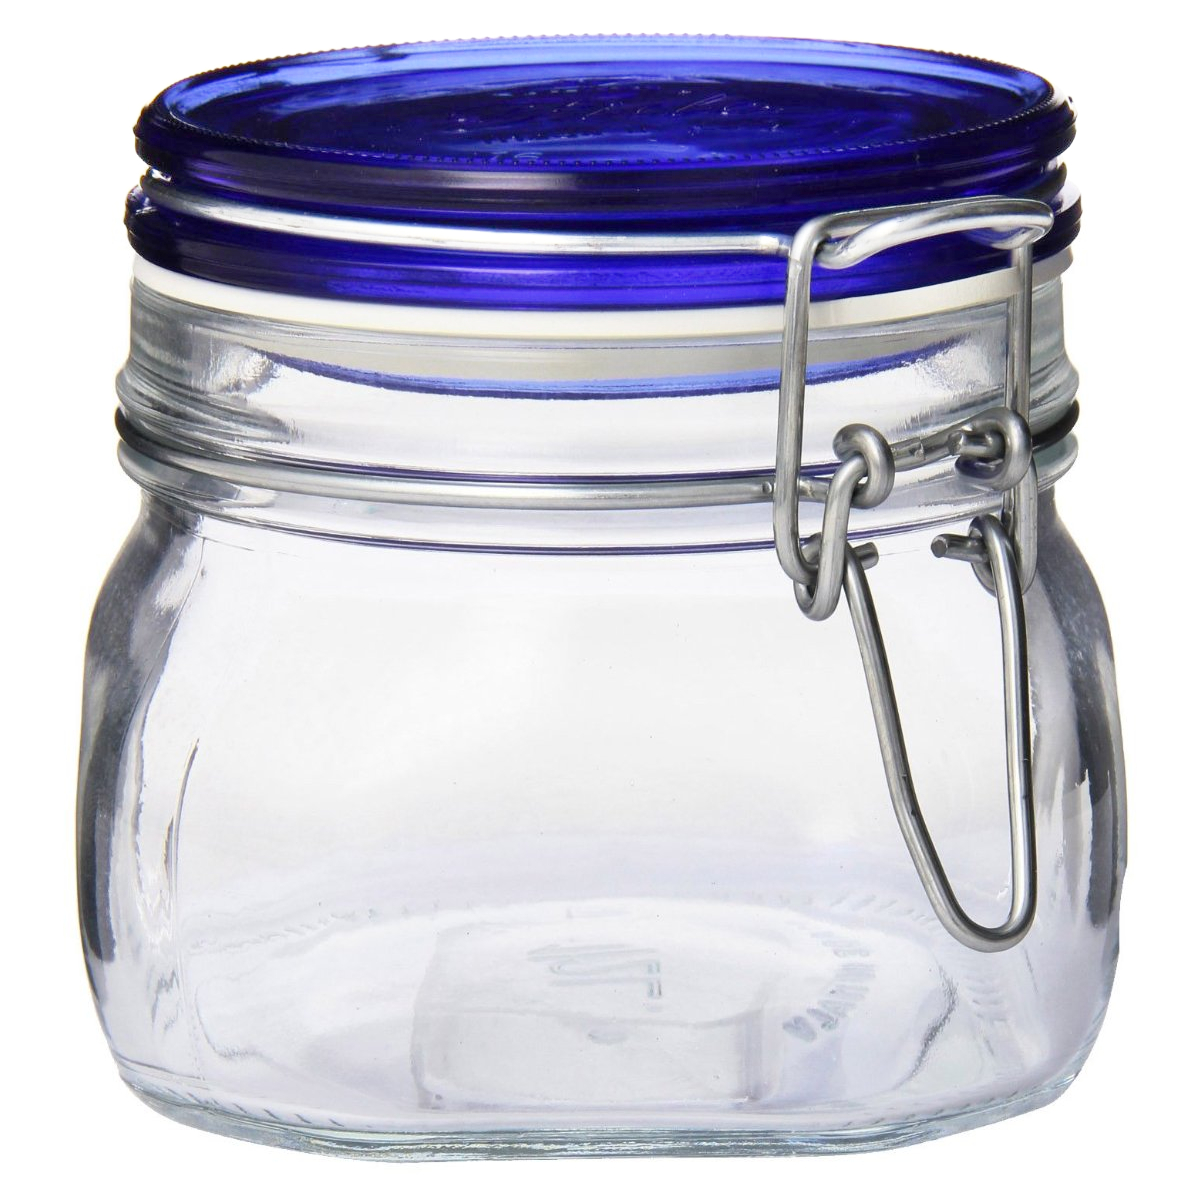 Bormioli Rocco Fido Glass 17.5 Ounce Square Jar with Blue Top